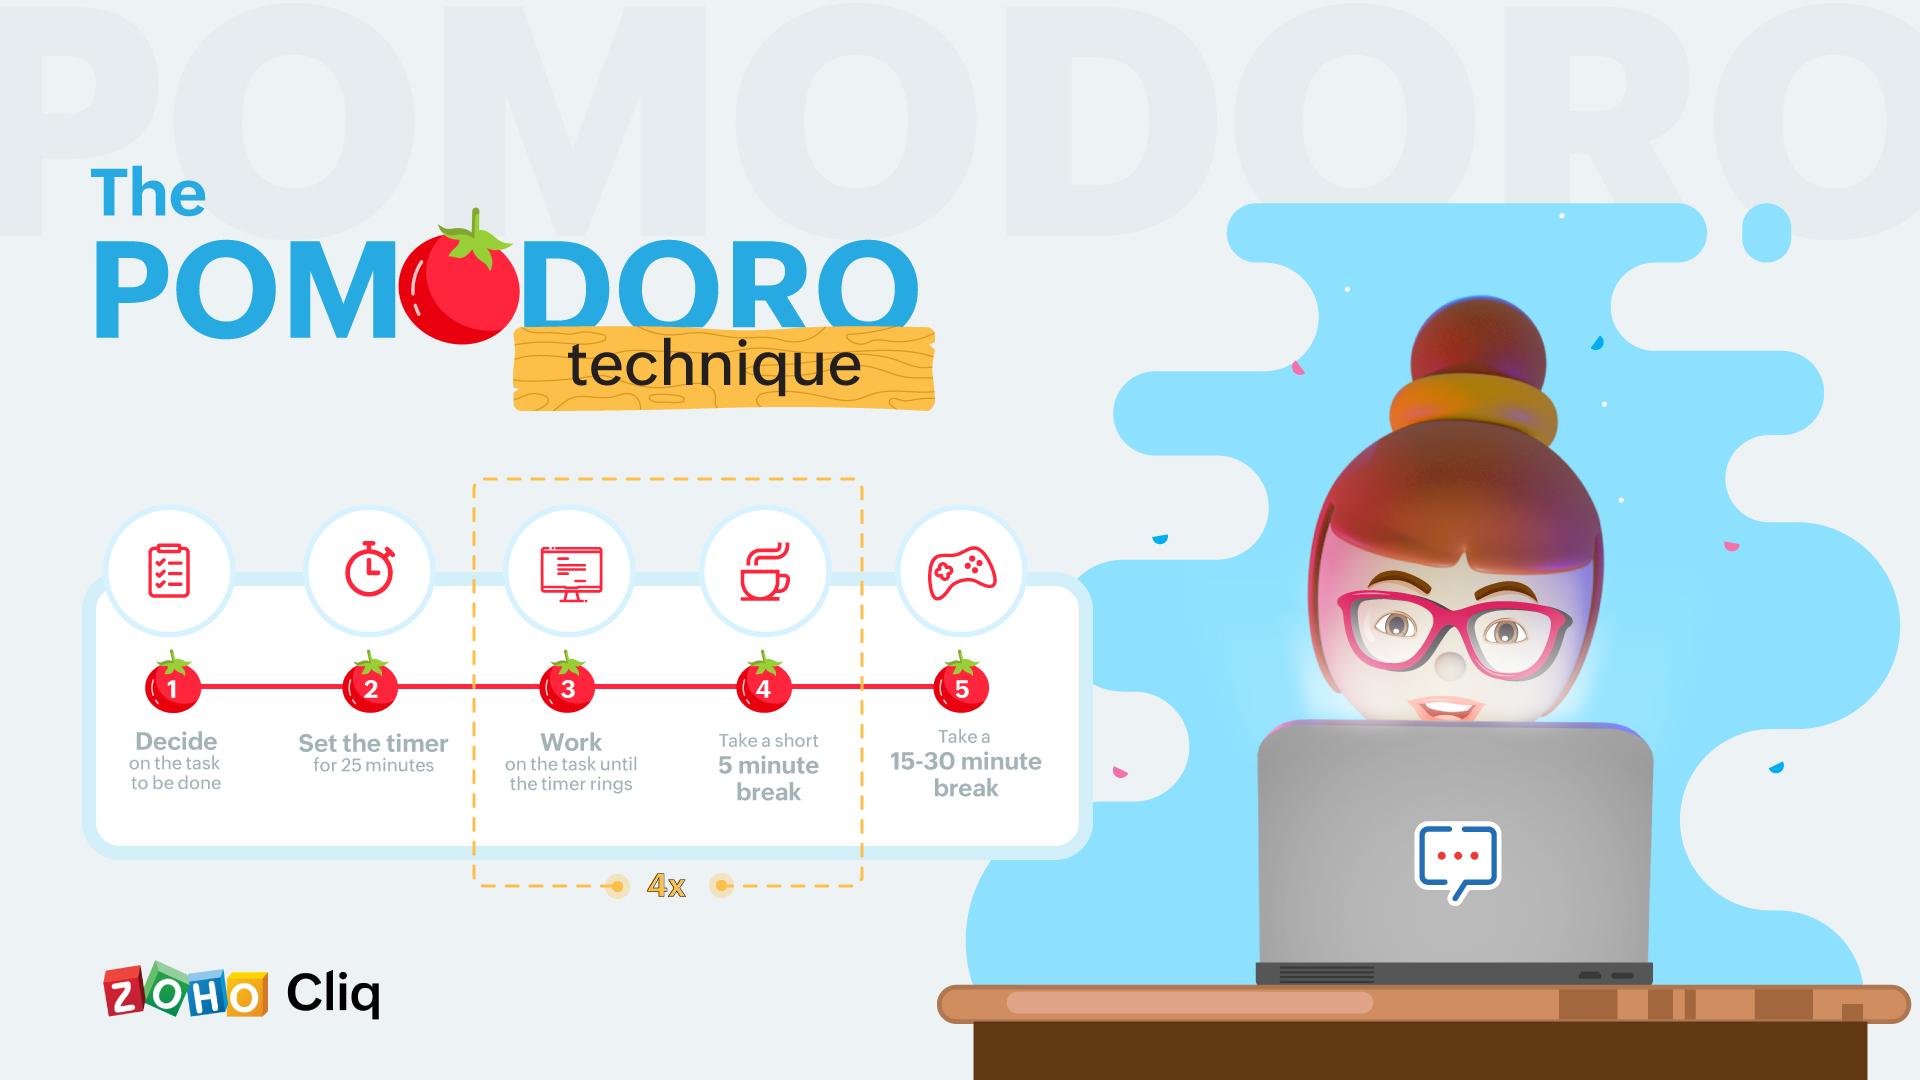 Time management using the Pomodoro technique in Cliq